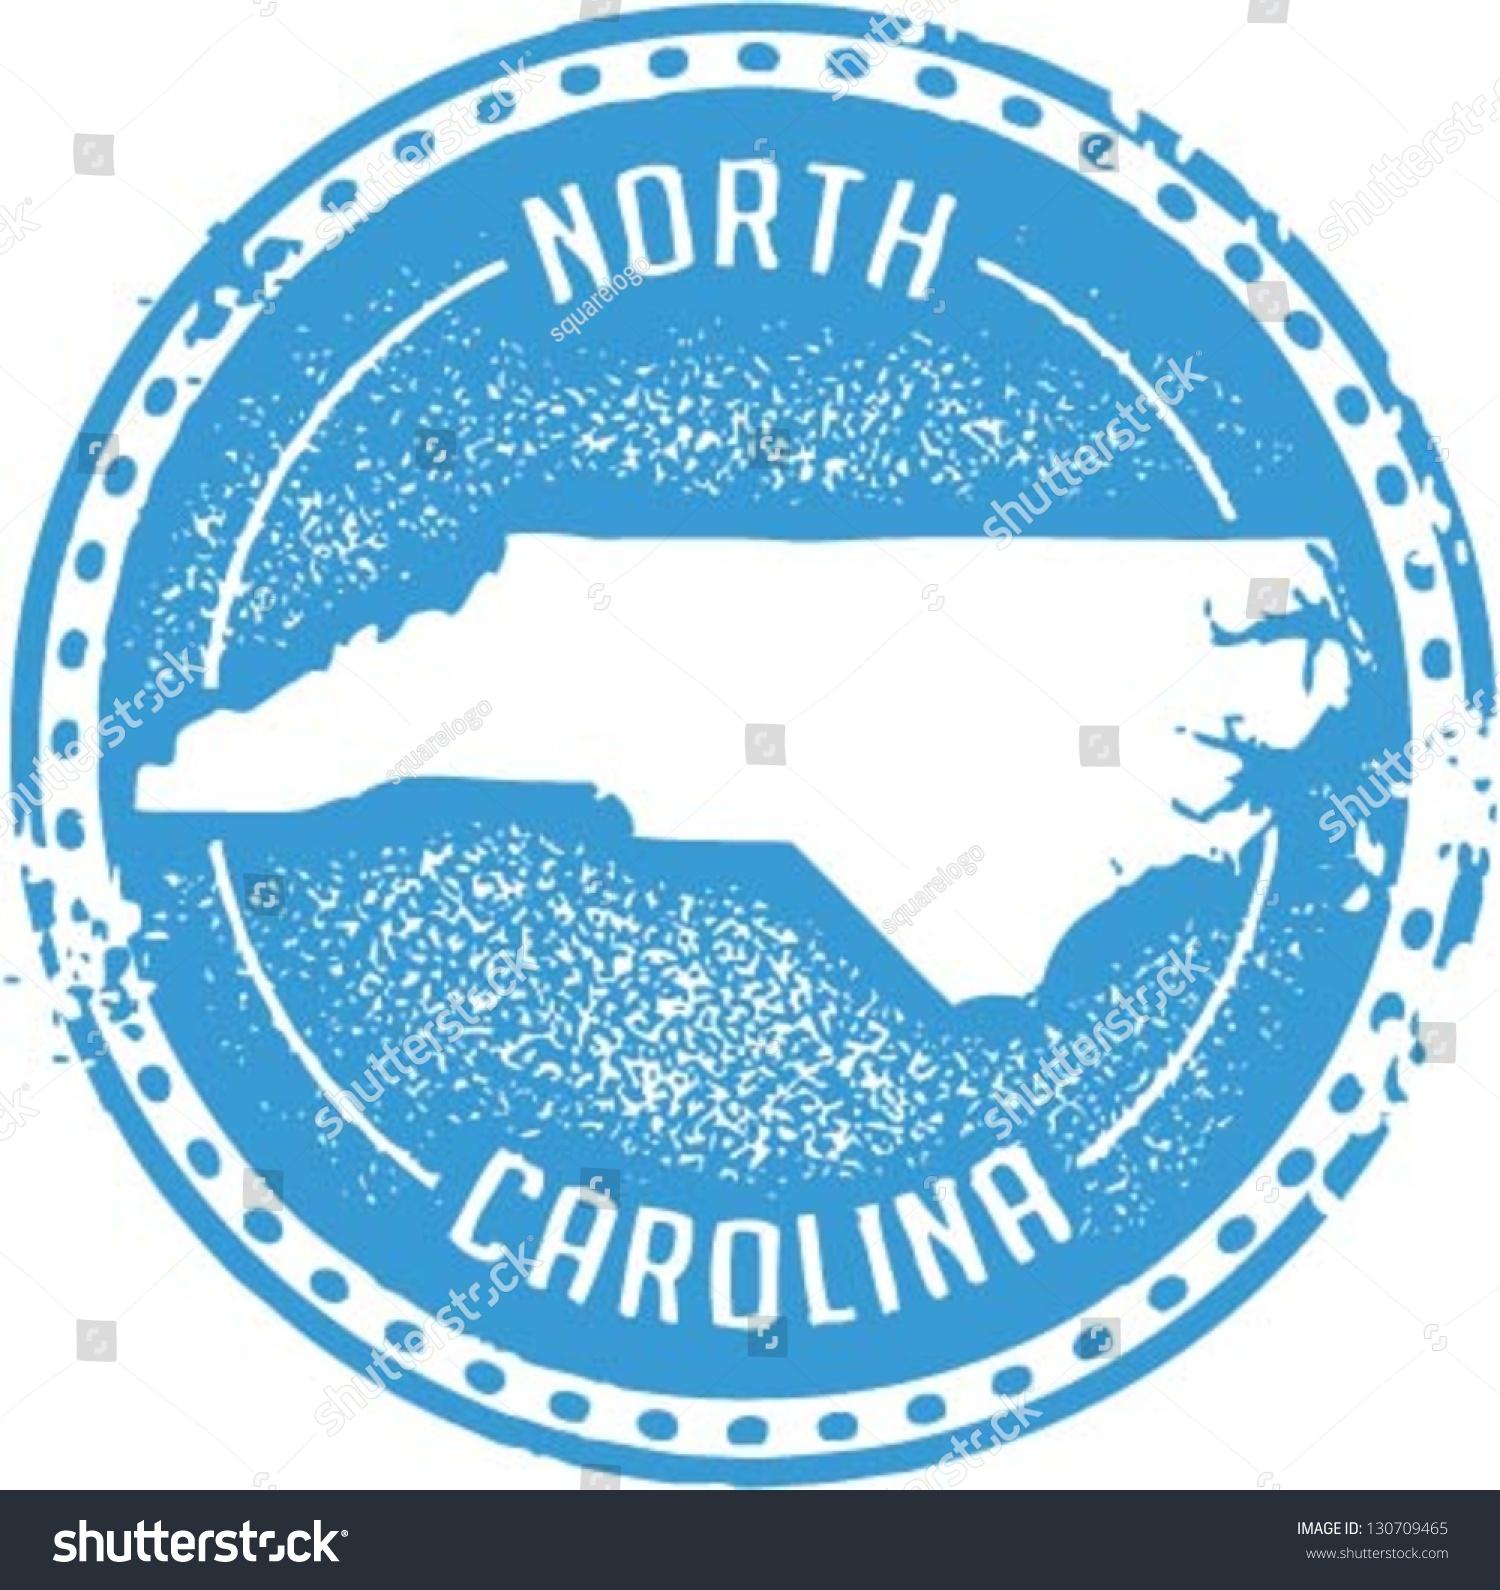 Vintage Style North Carolina Usa State Stock Vector